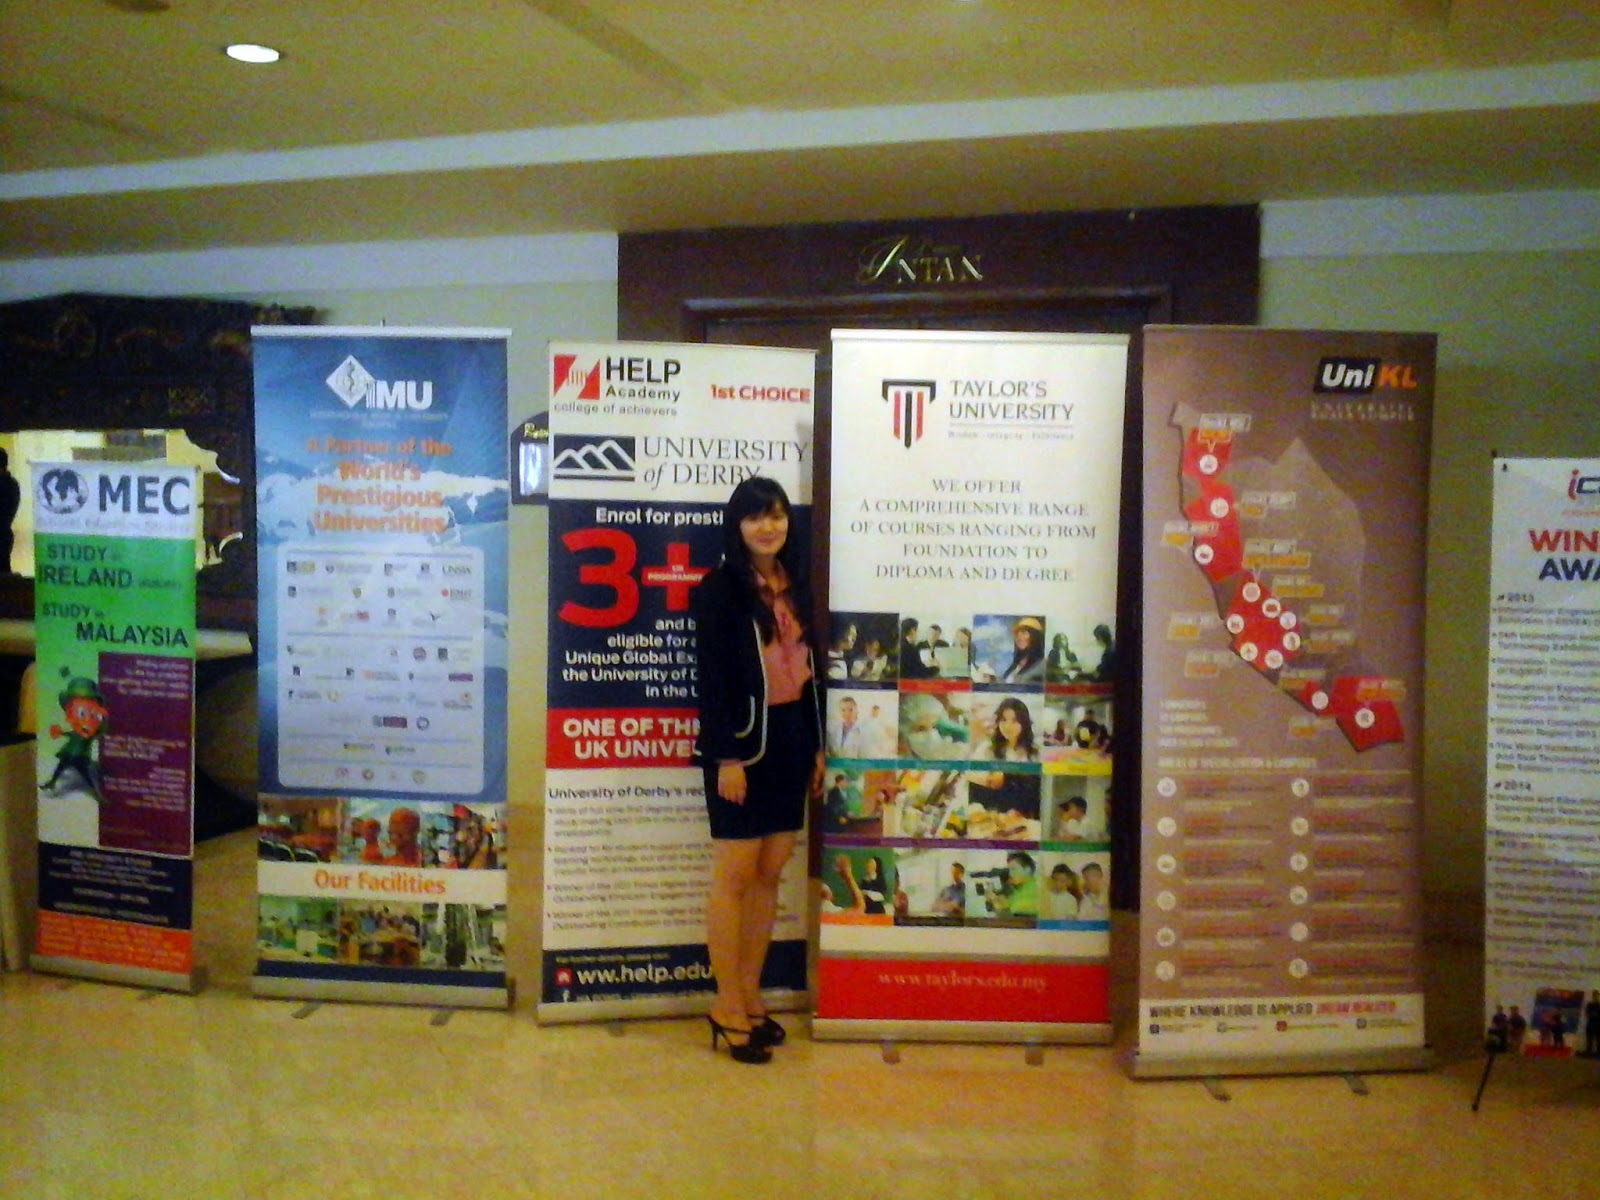 spg event jakarta, agency spg jakarta, job spg jakarta, agency spg indonesia